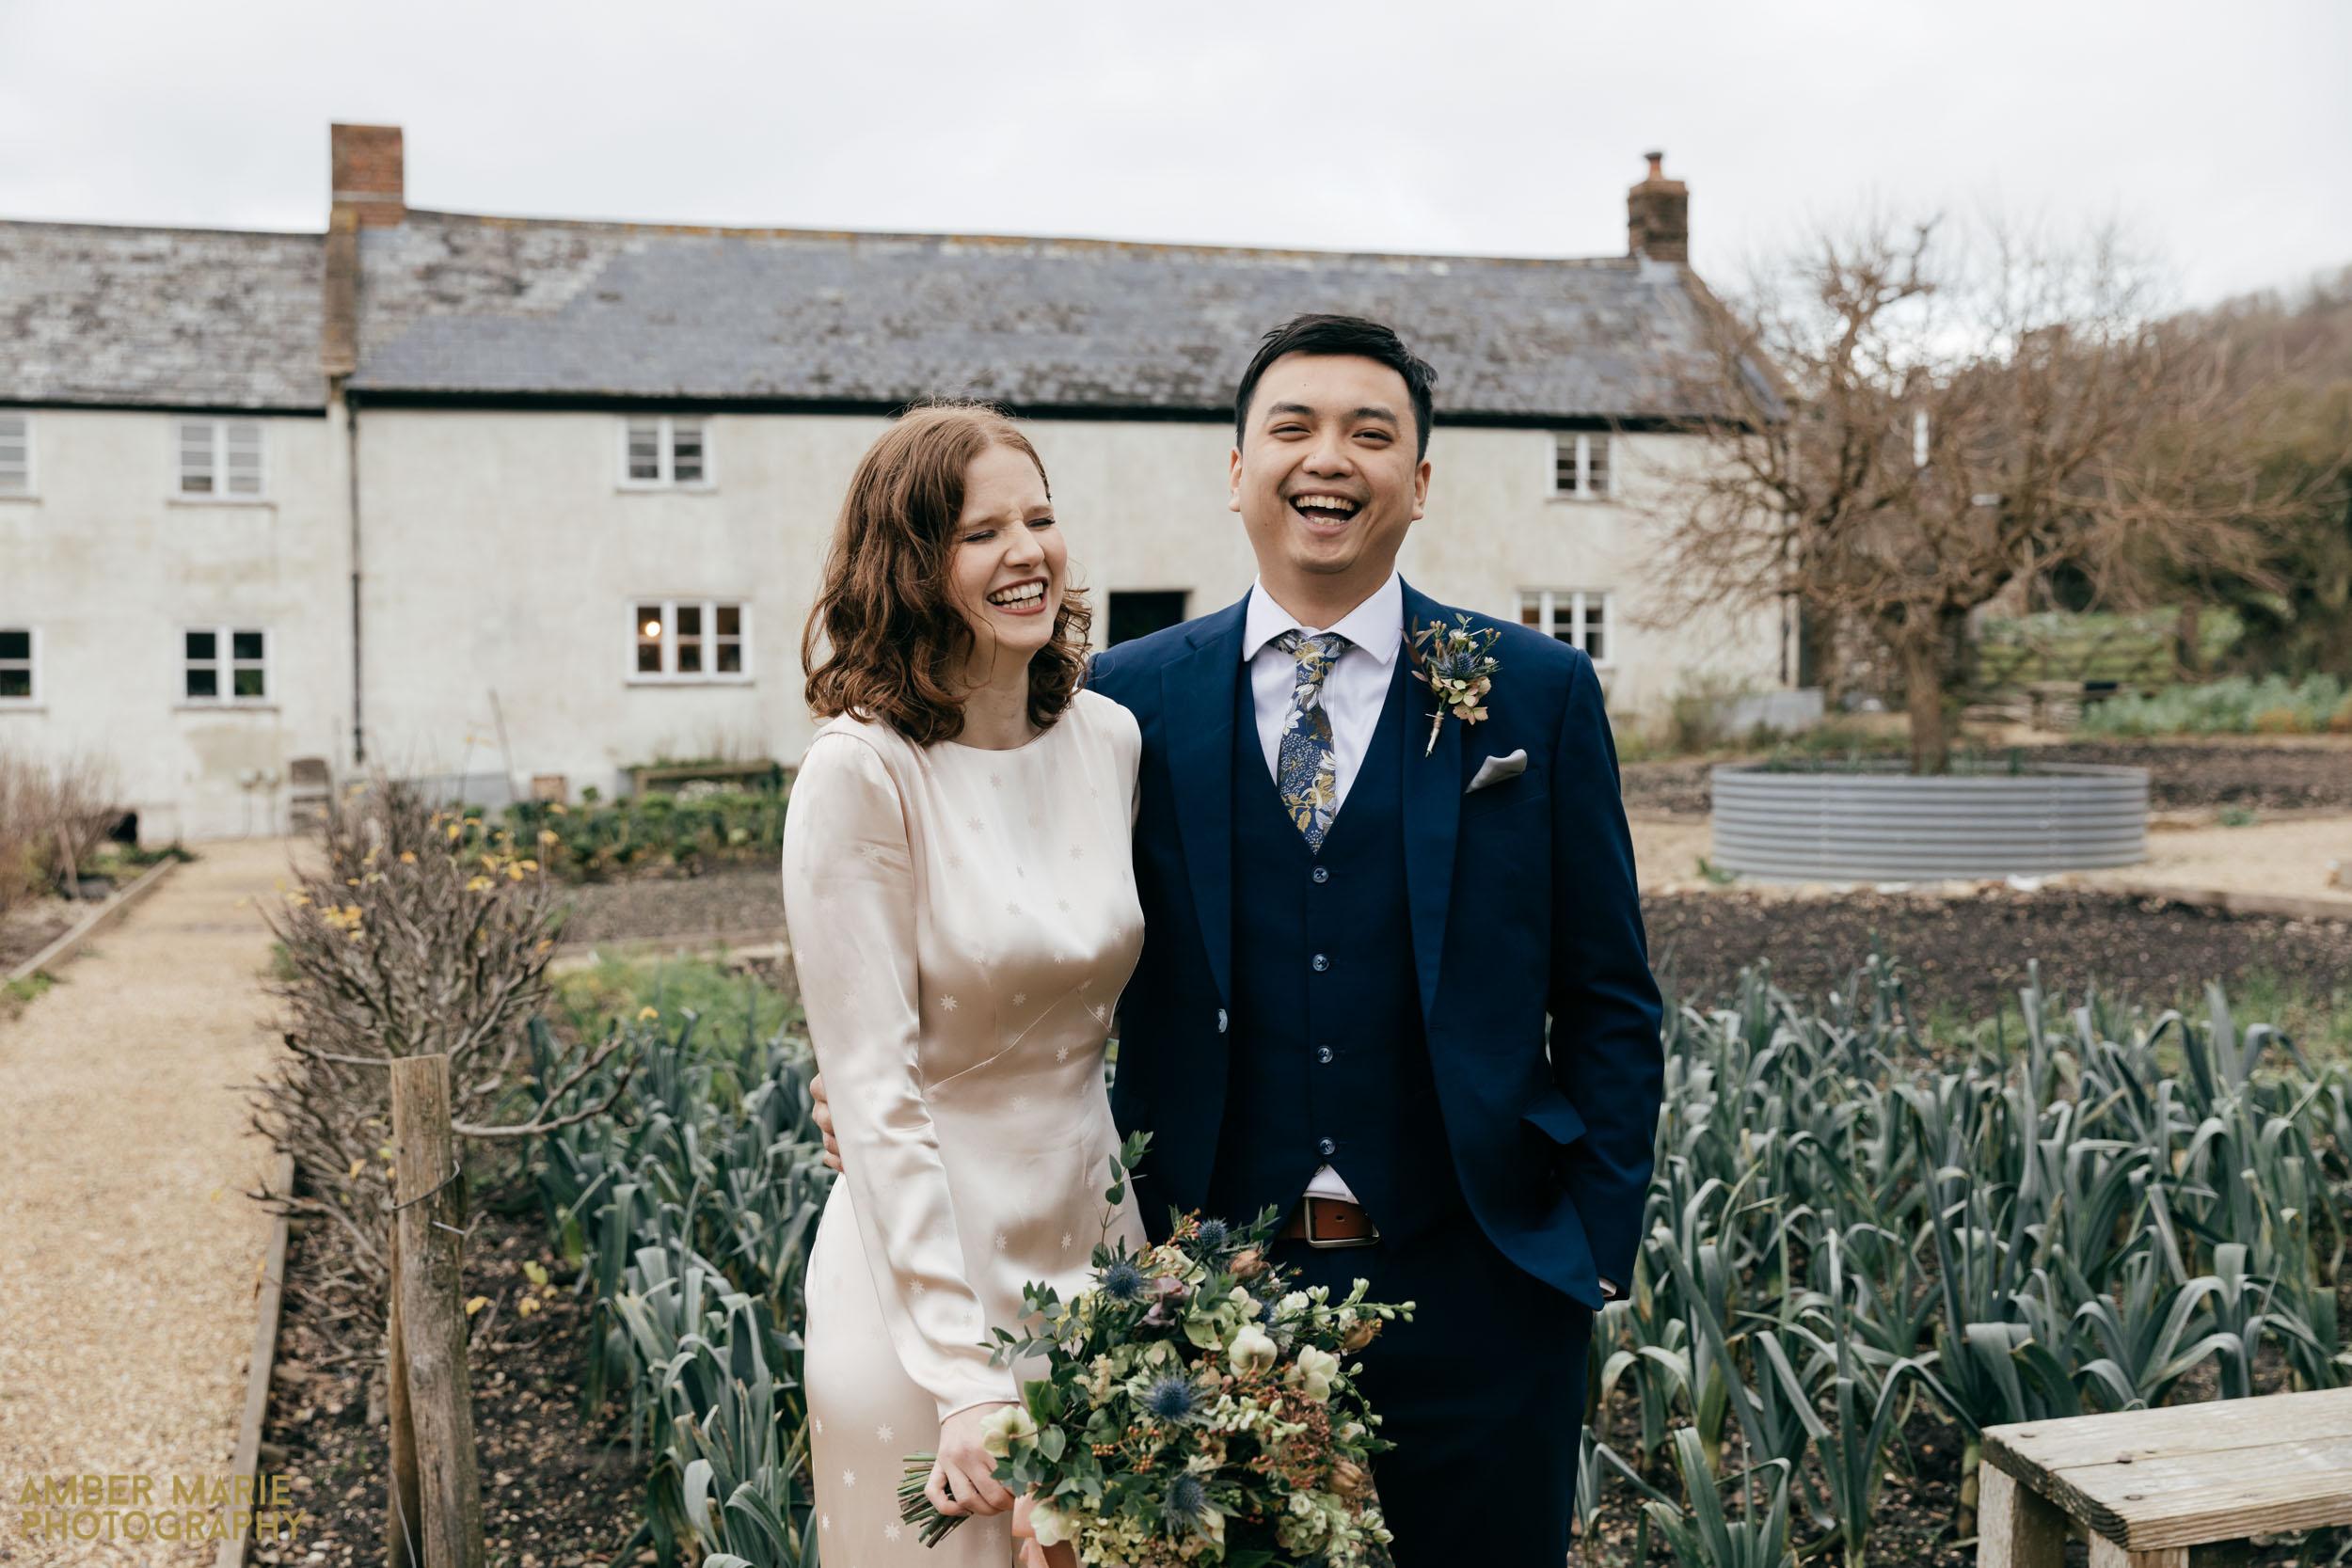 stylish winter wedding photography by creative wedding photographer